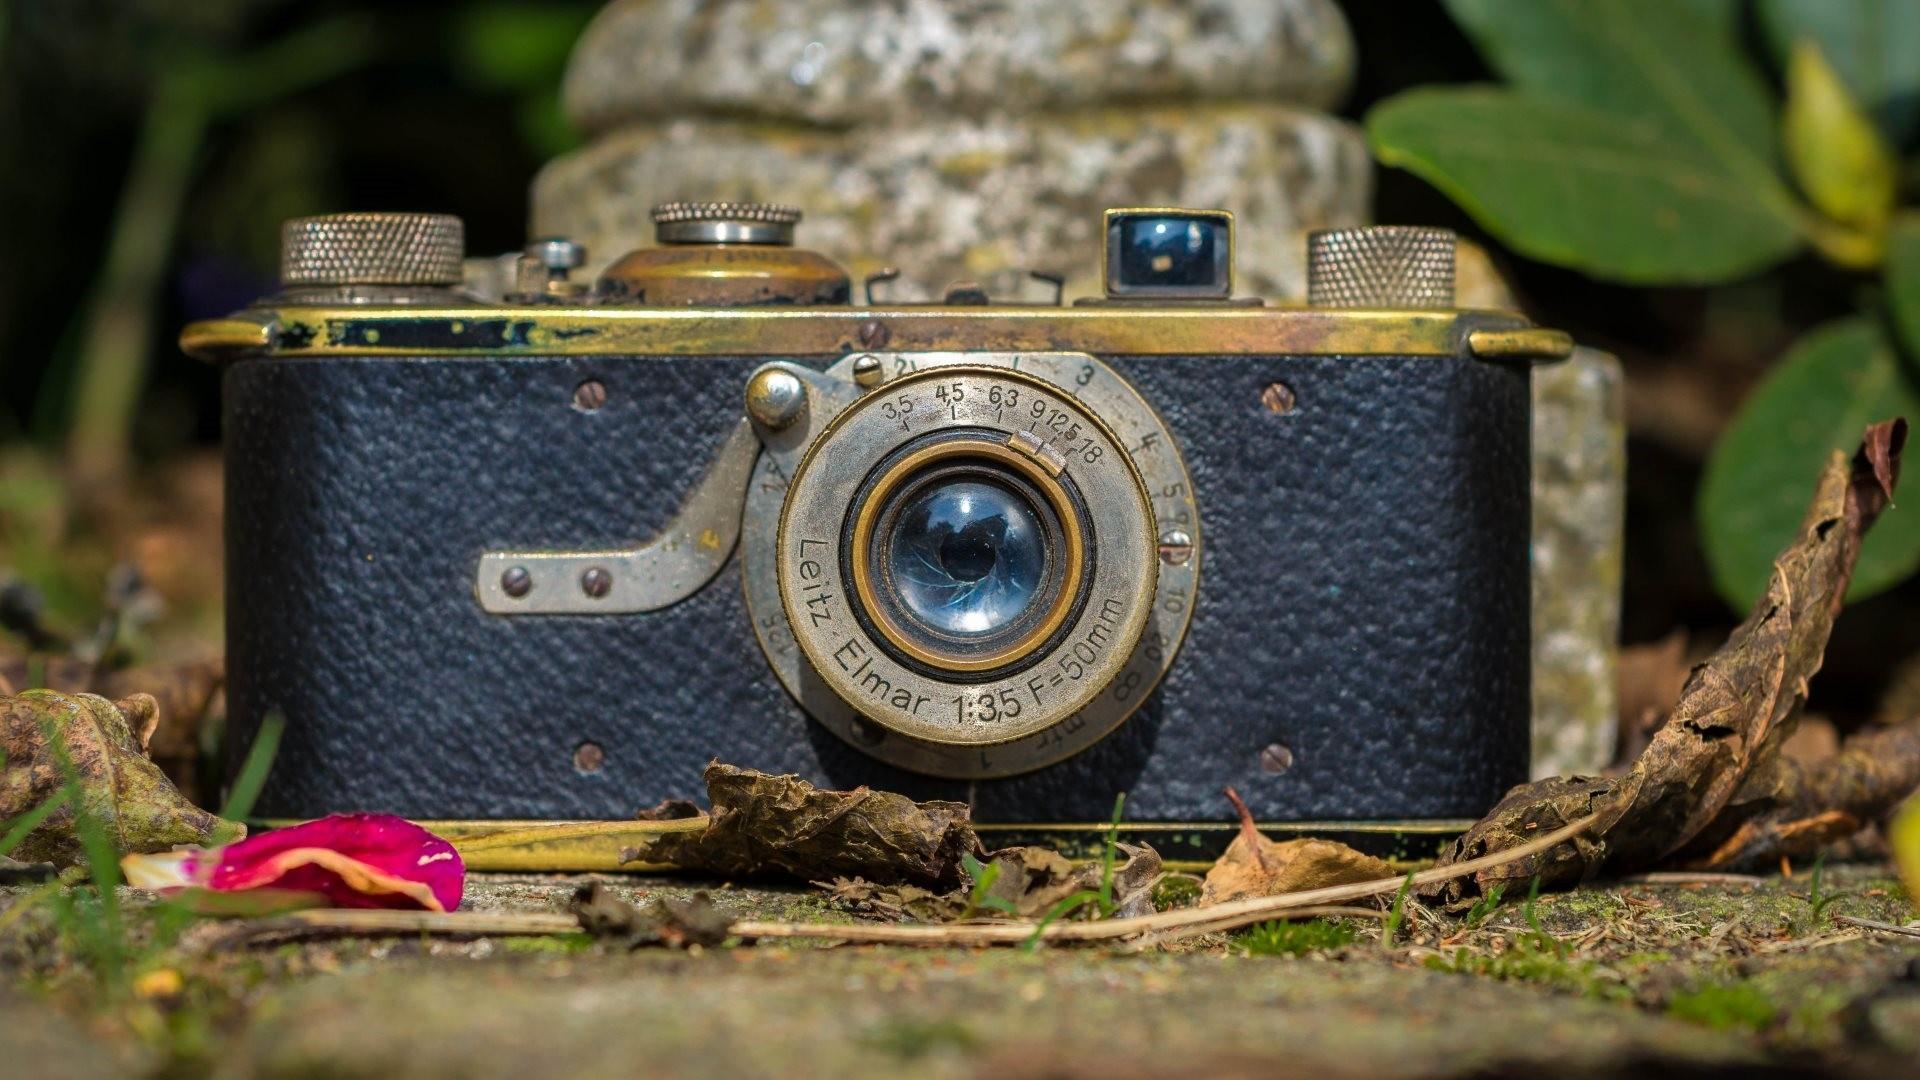 Camera hd desktop wallpaper